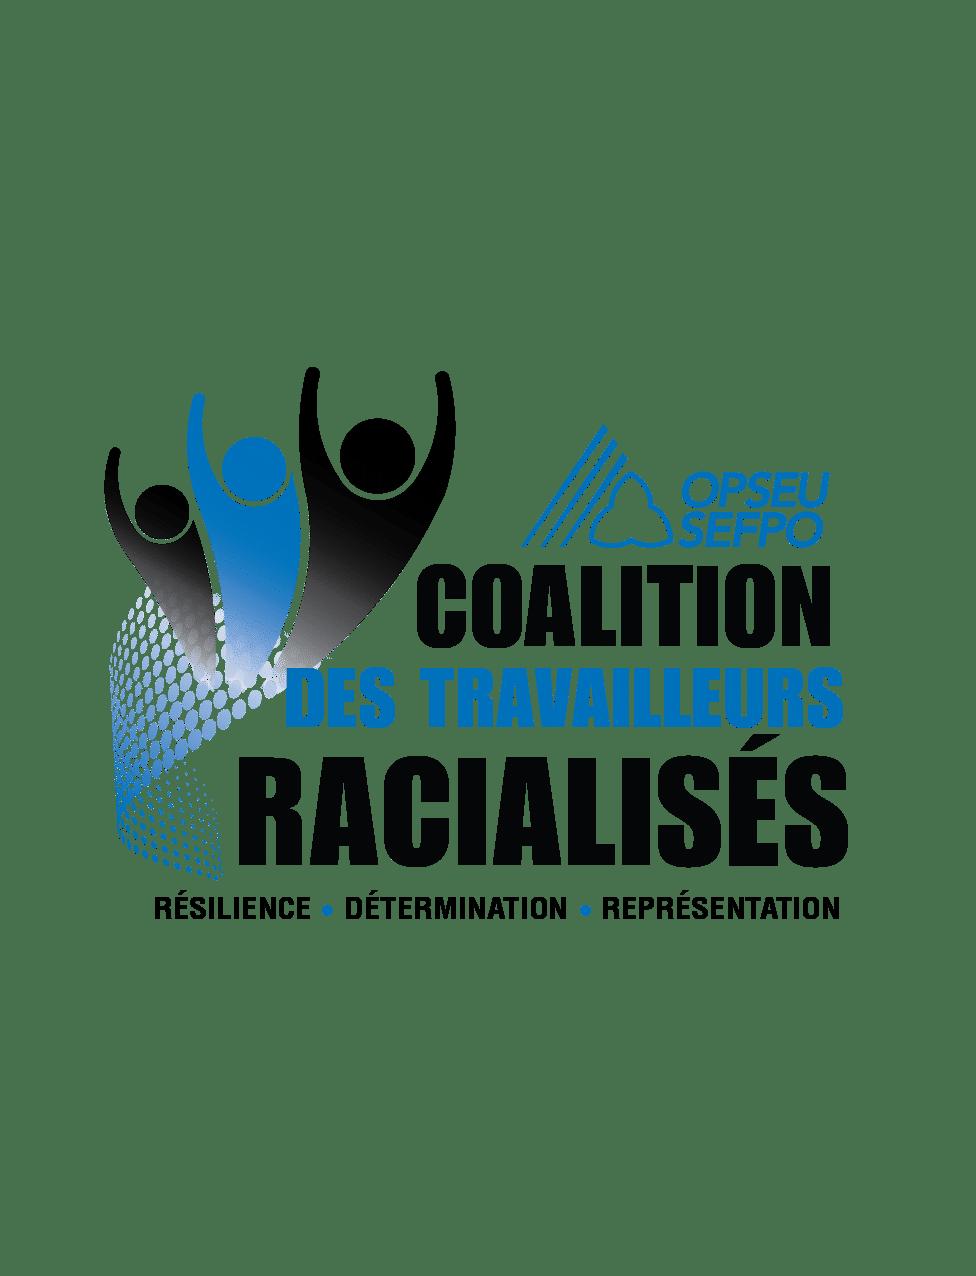 OPSEU Coalition des Travailleurs Racialises. Resilience, determination, representation